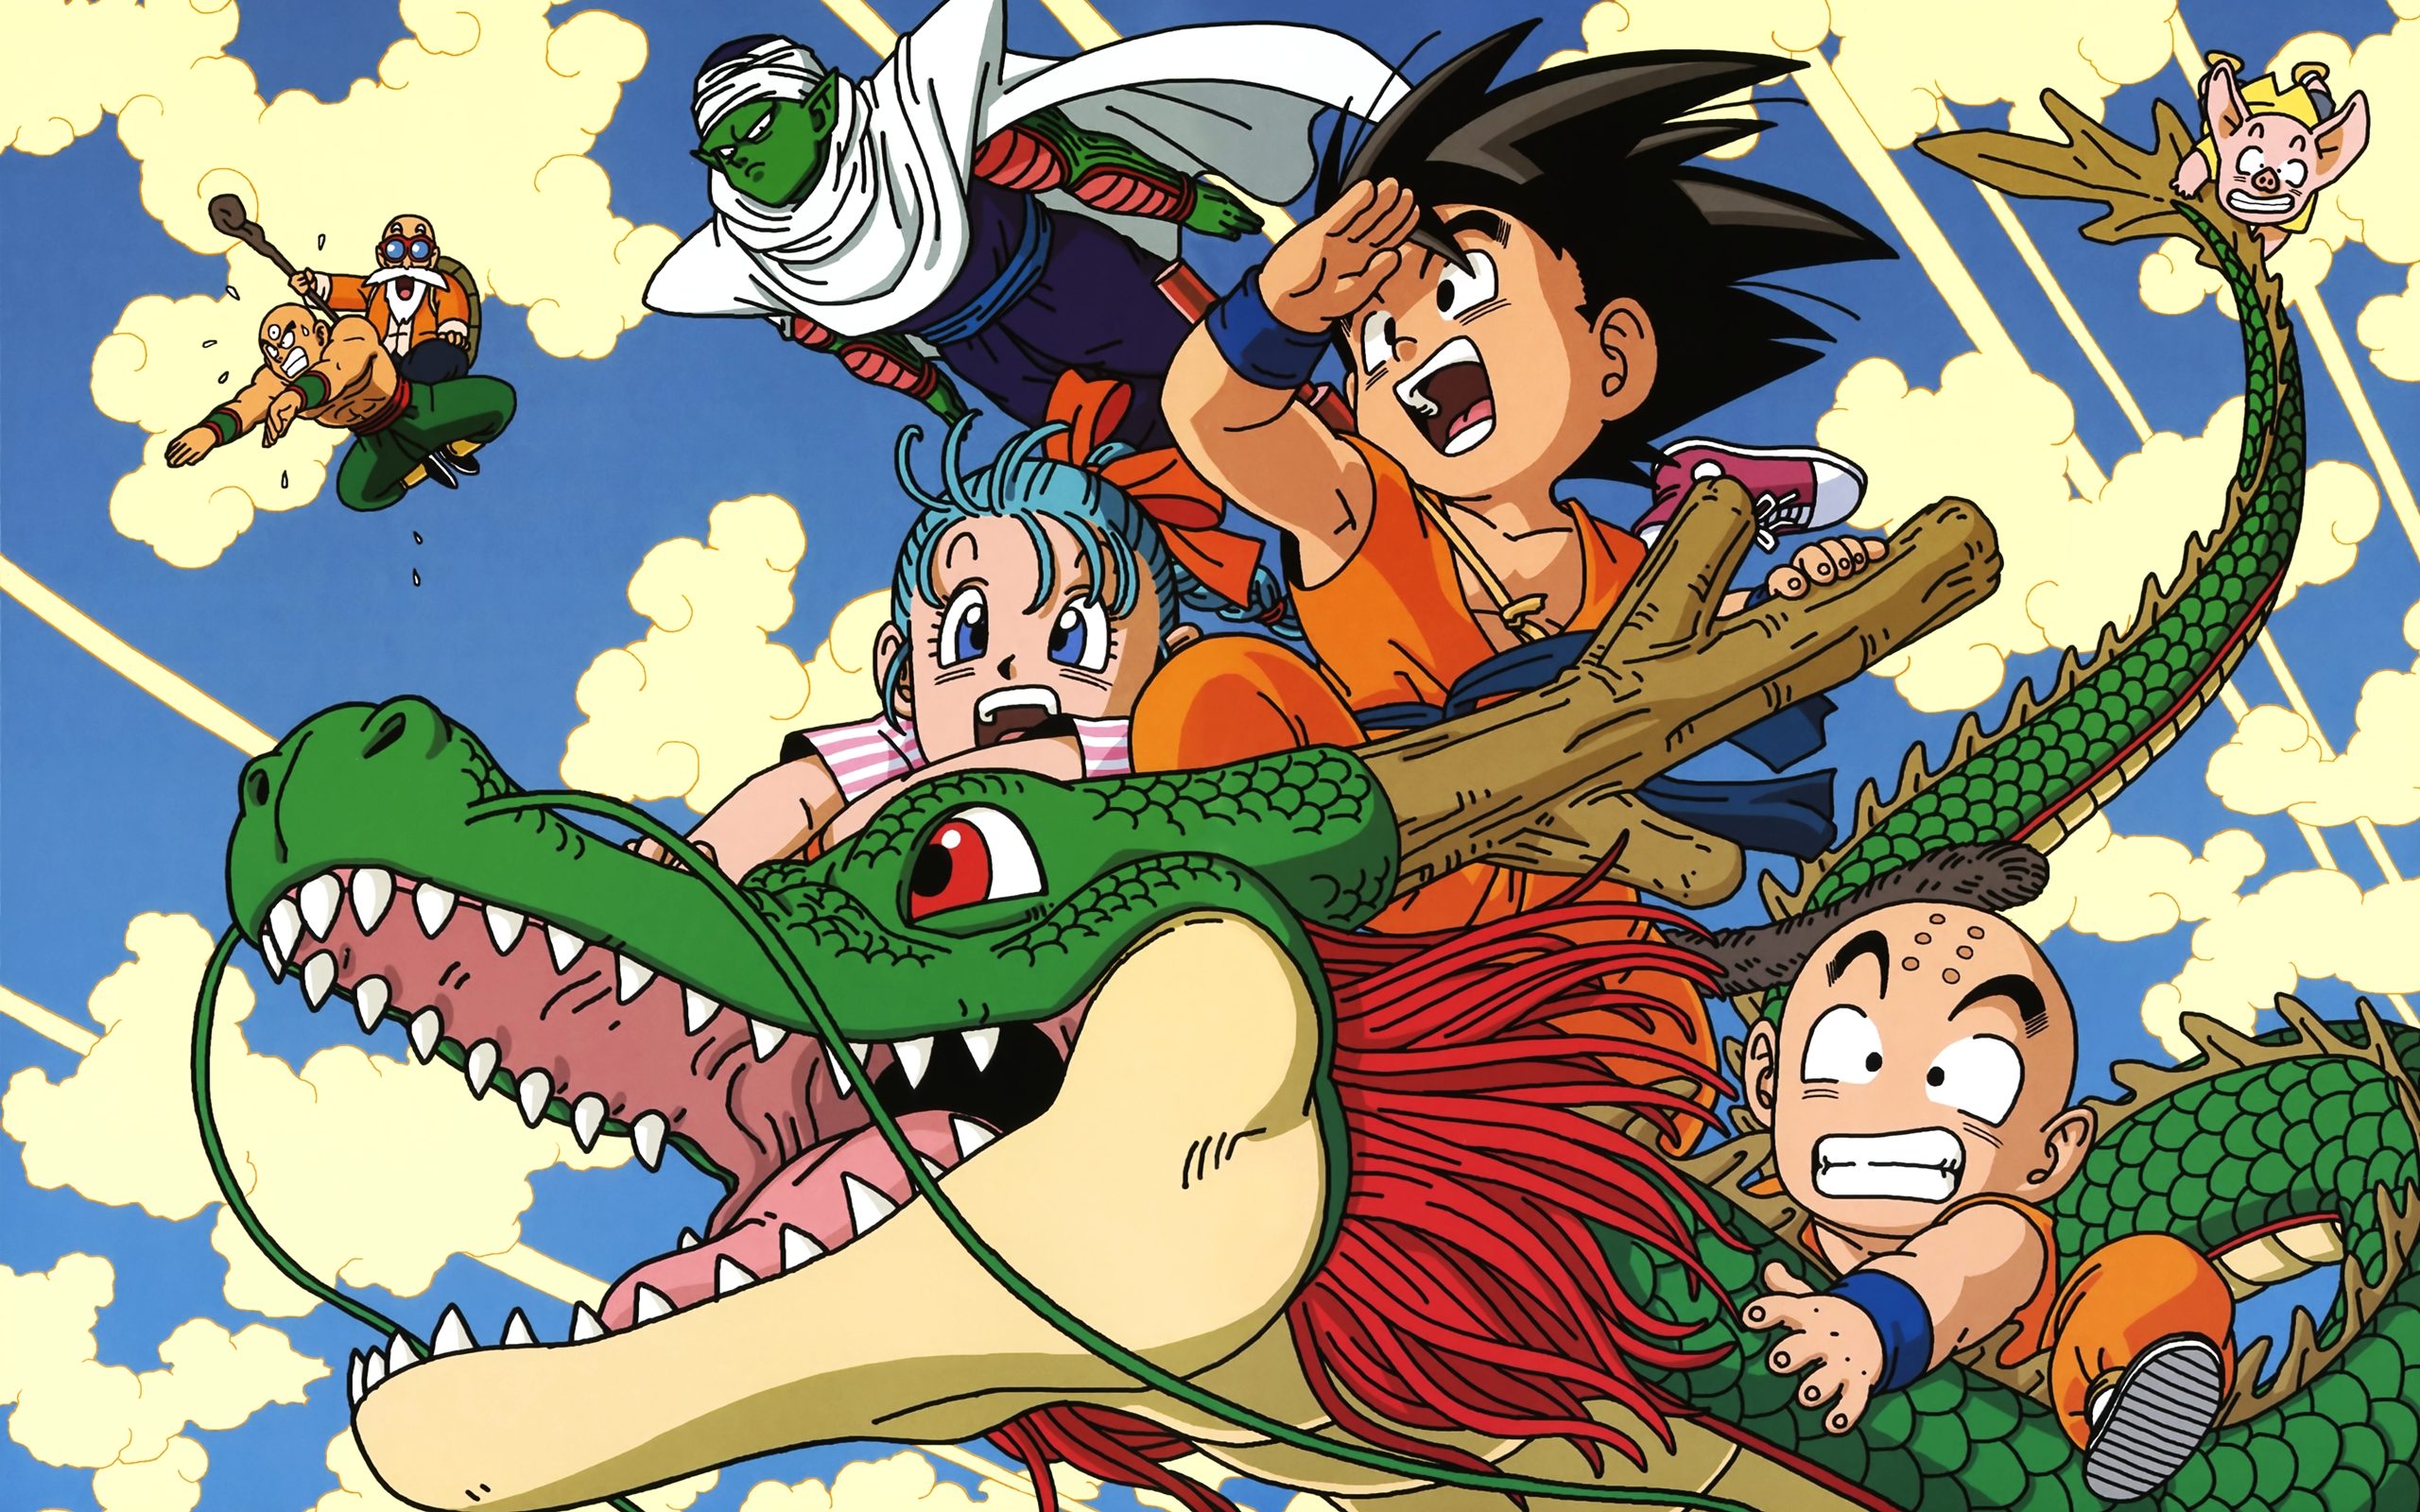 Fantastic Dragon Ball Z Wallpaper